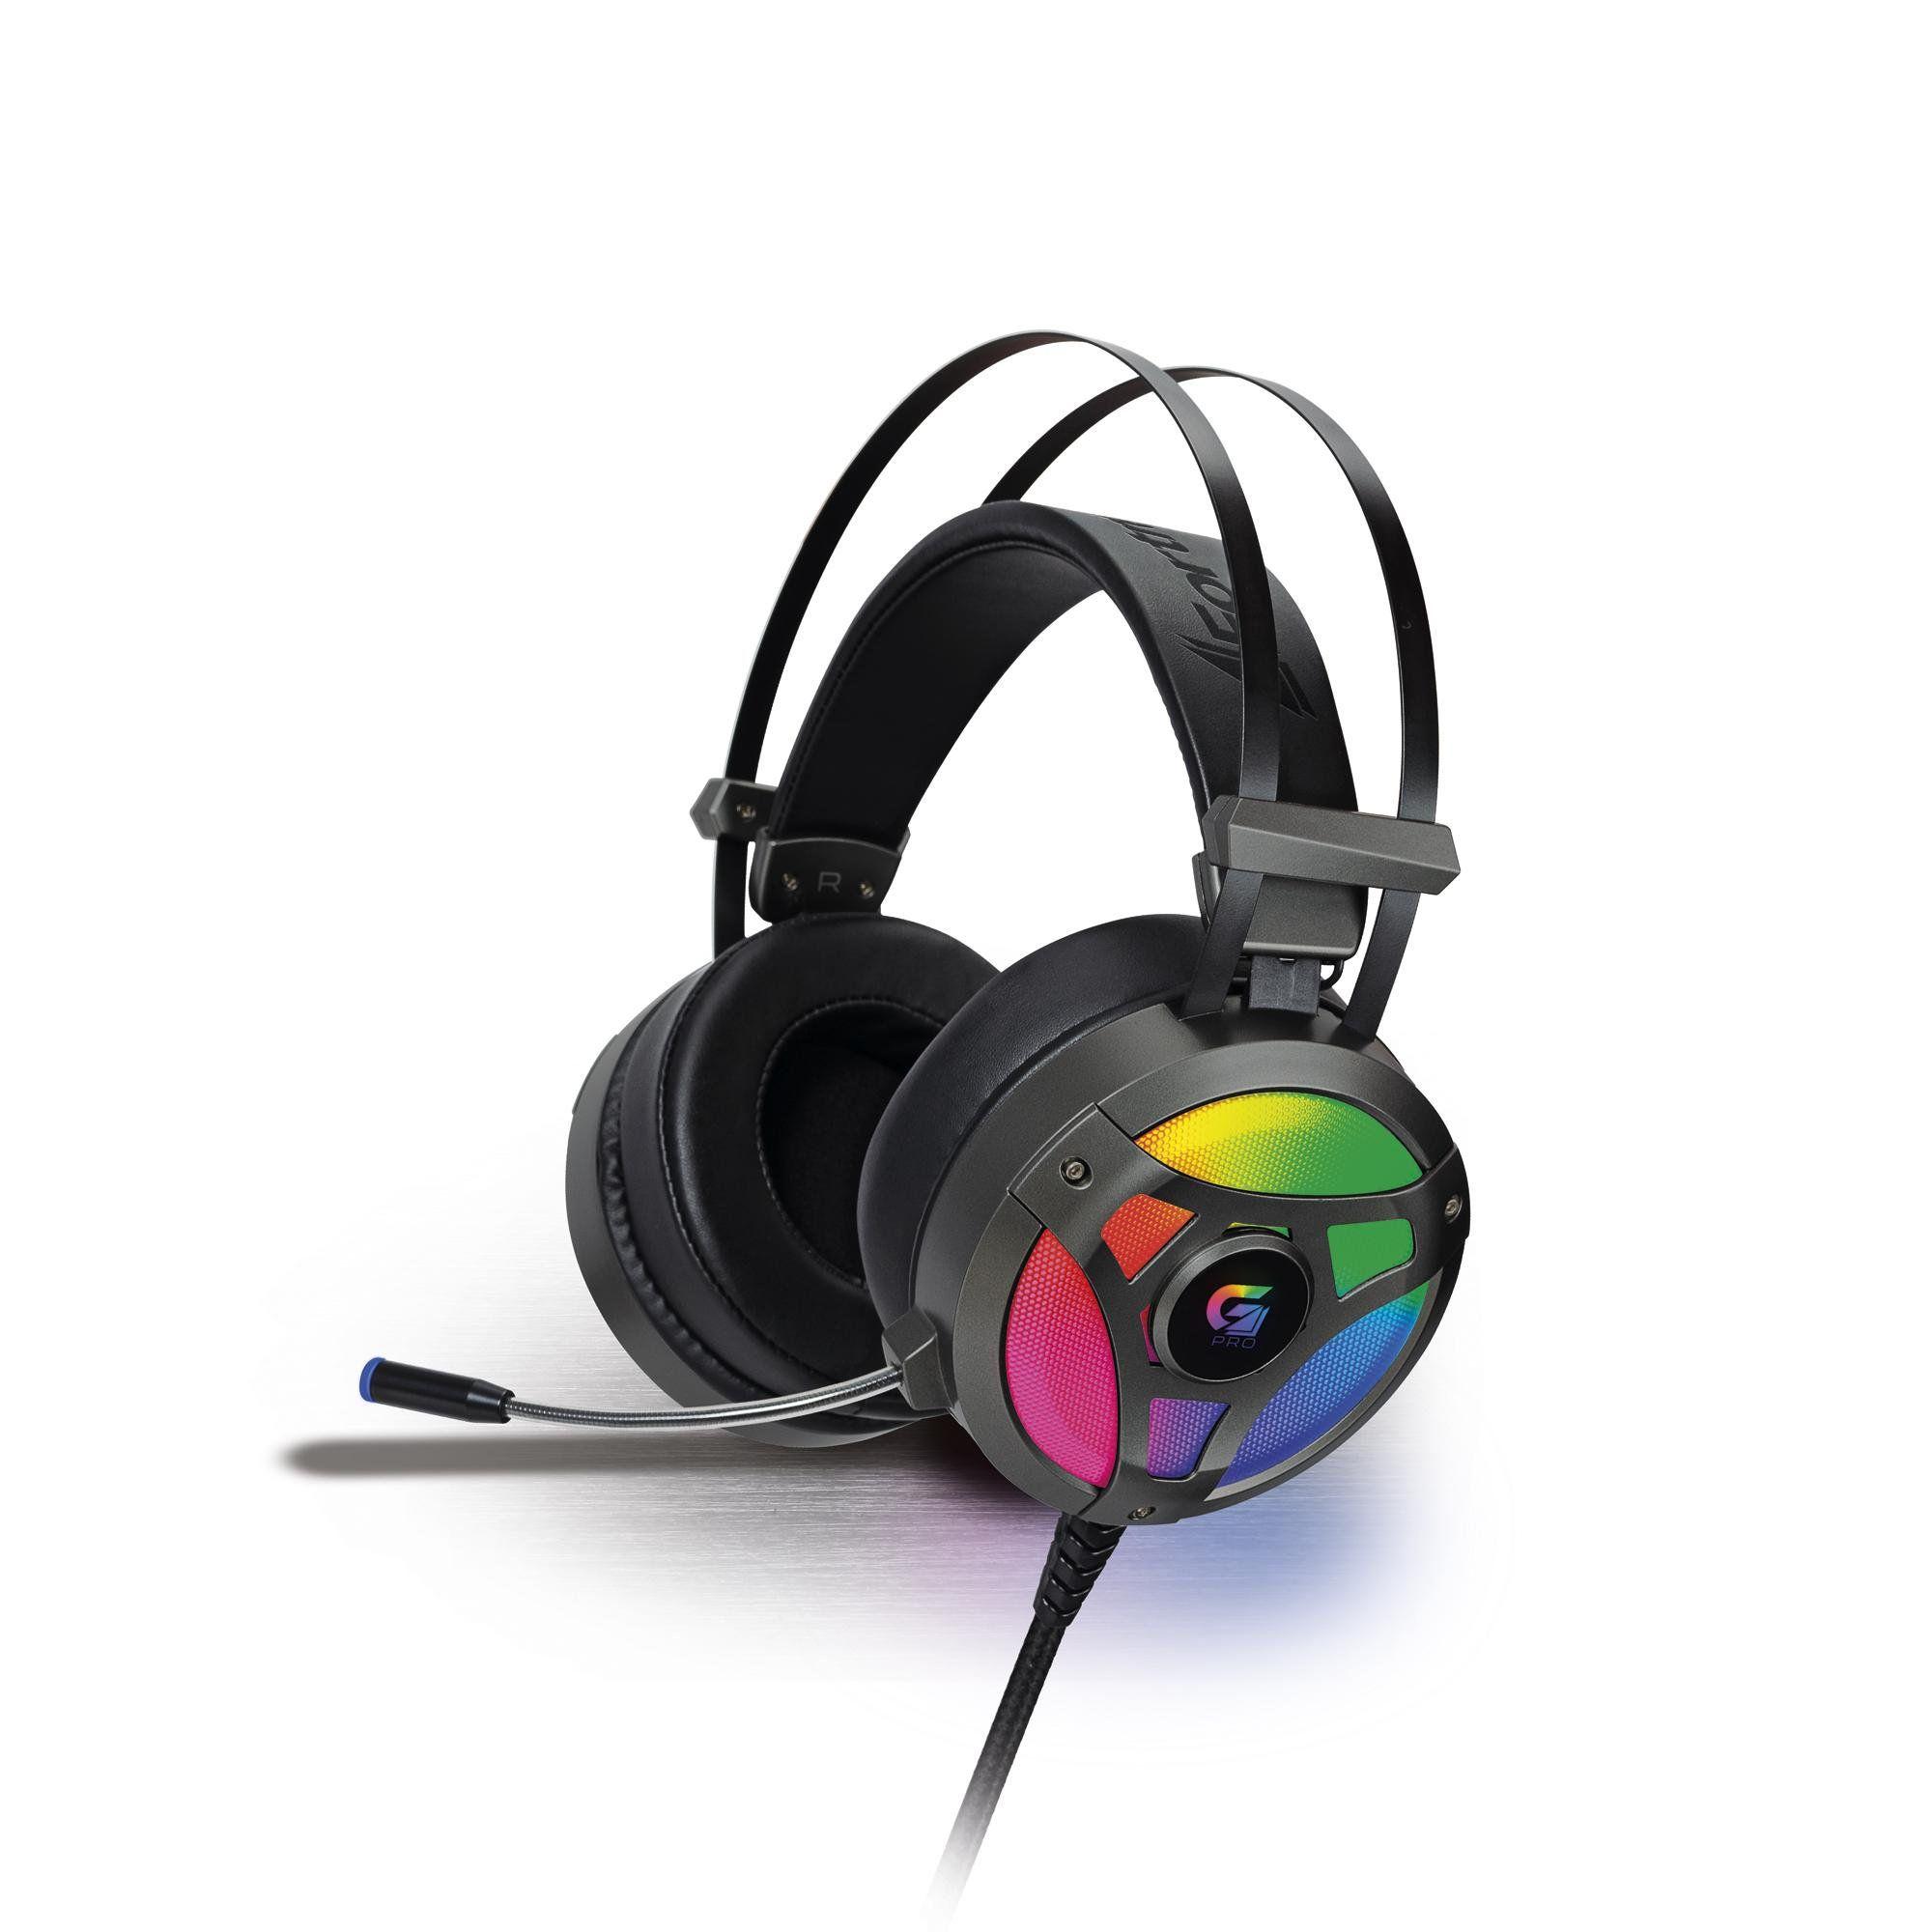 Headset Gamer RGB G Pro H1+ 7.1 Cinza 65905 Fortrek